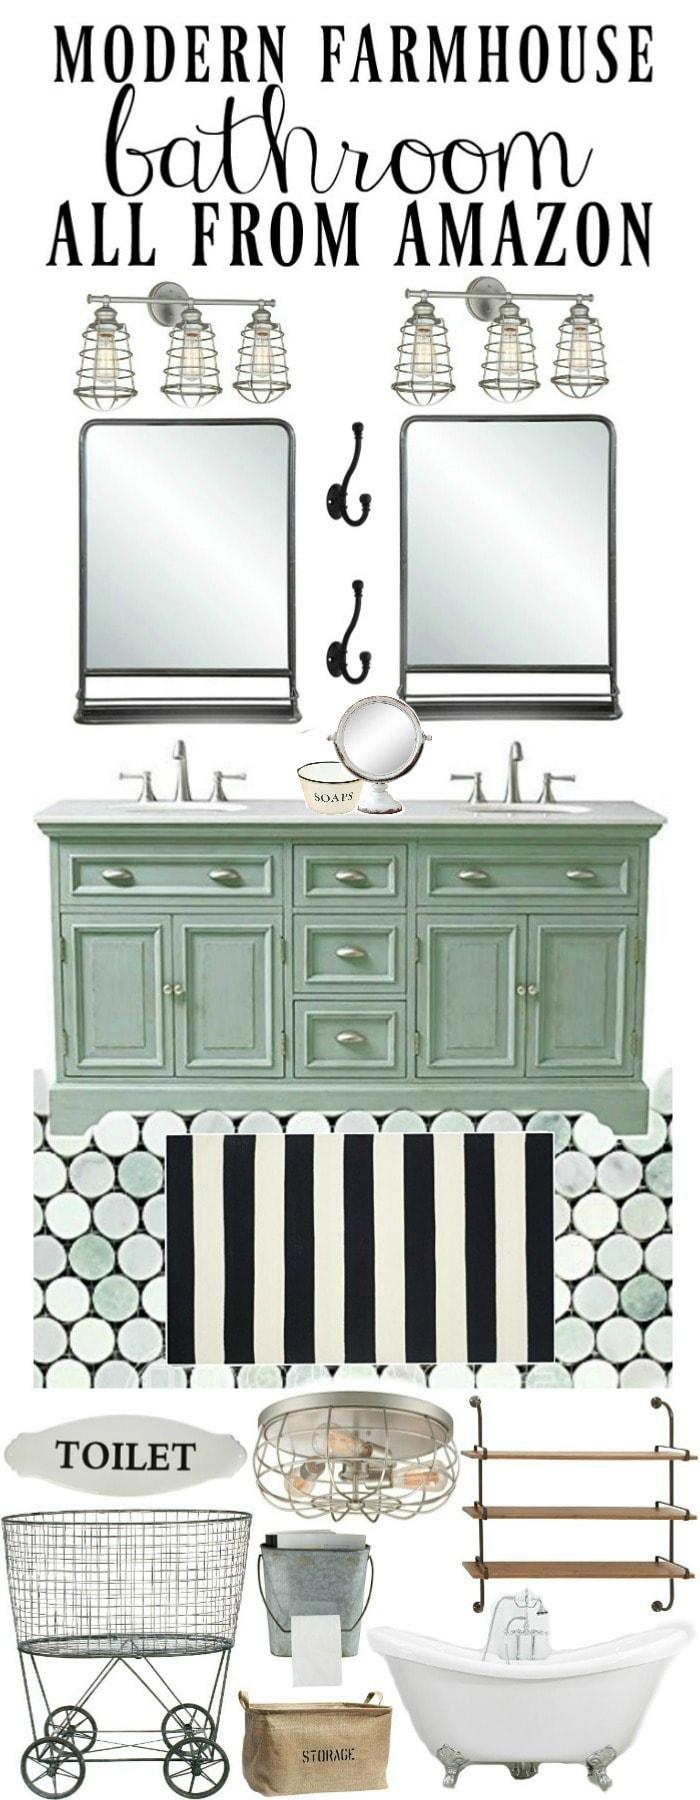 Modern farmhouse bathroom design - All from Amazon!